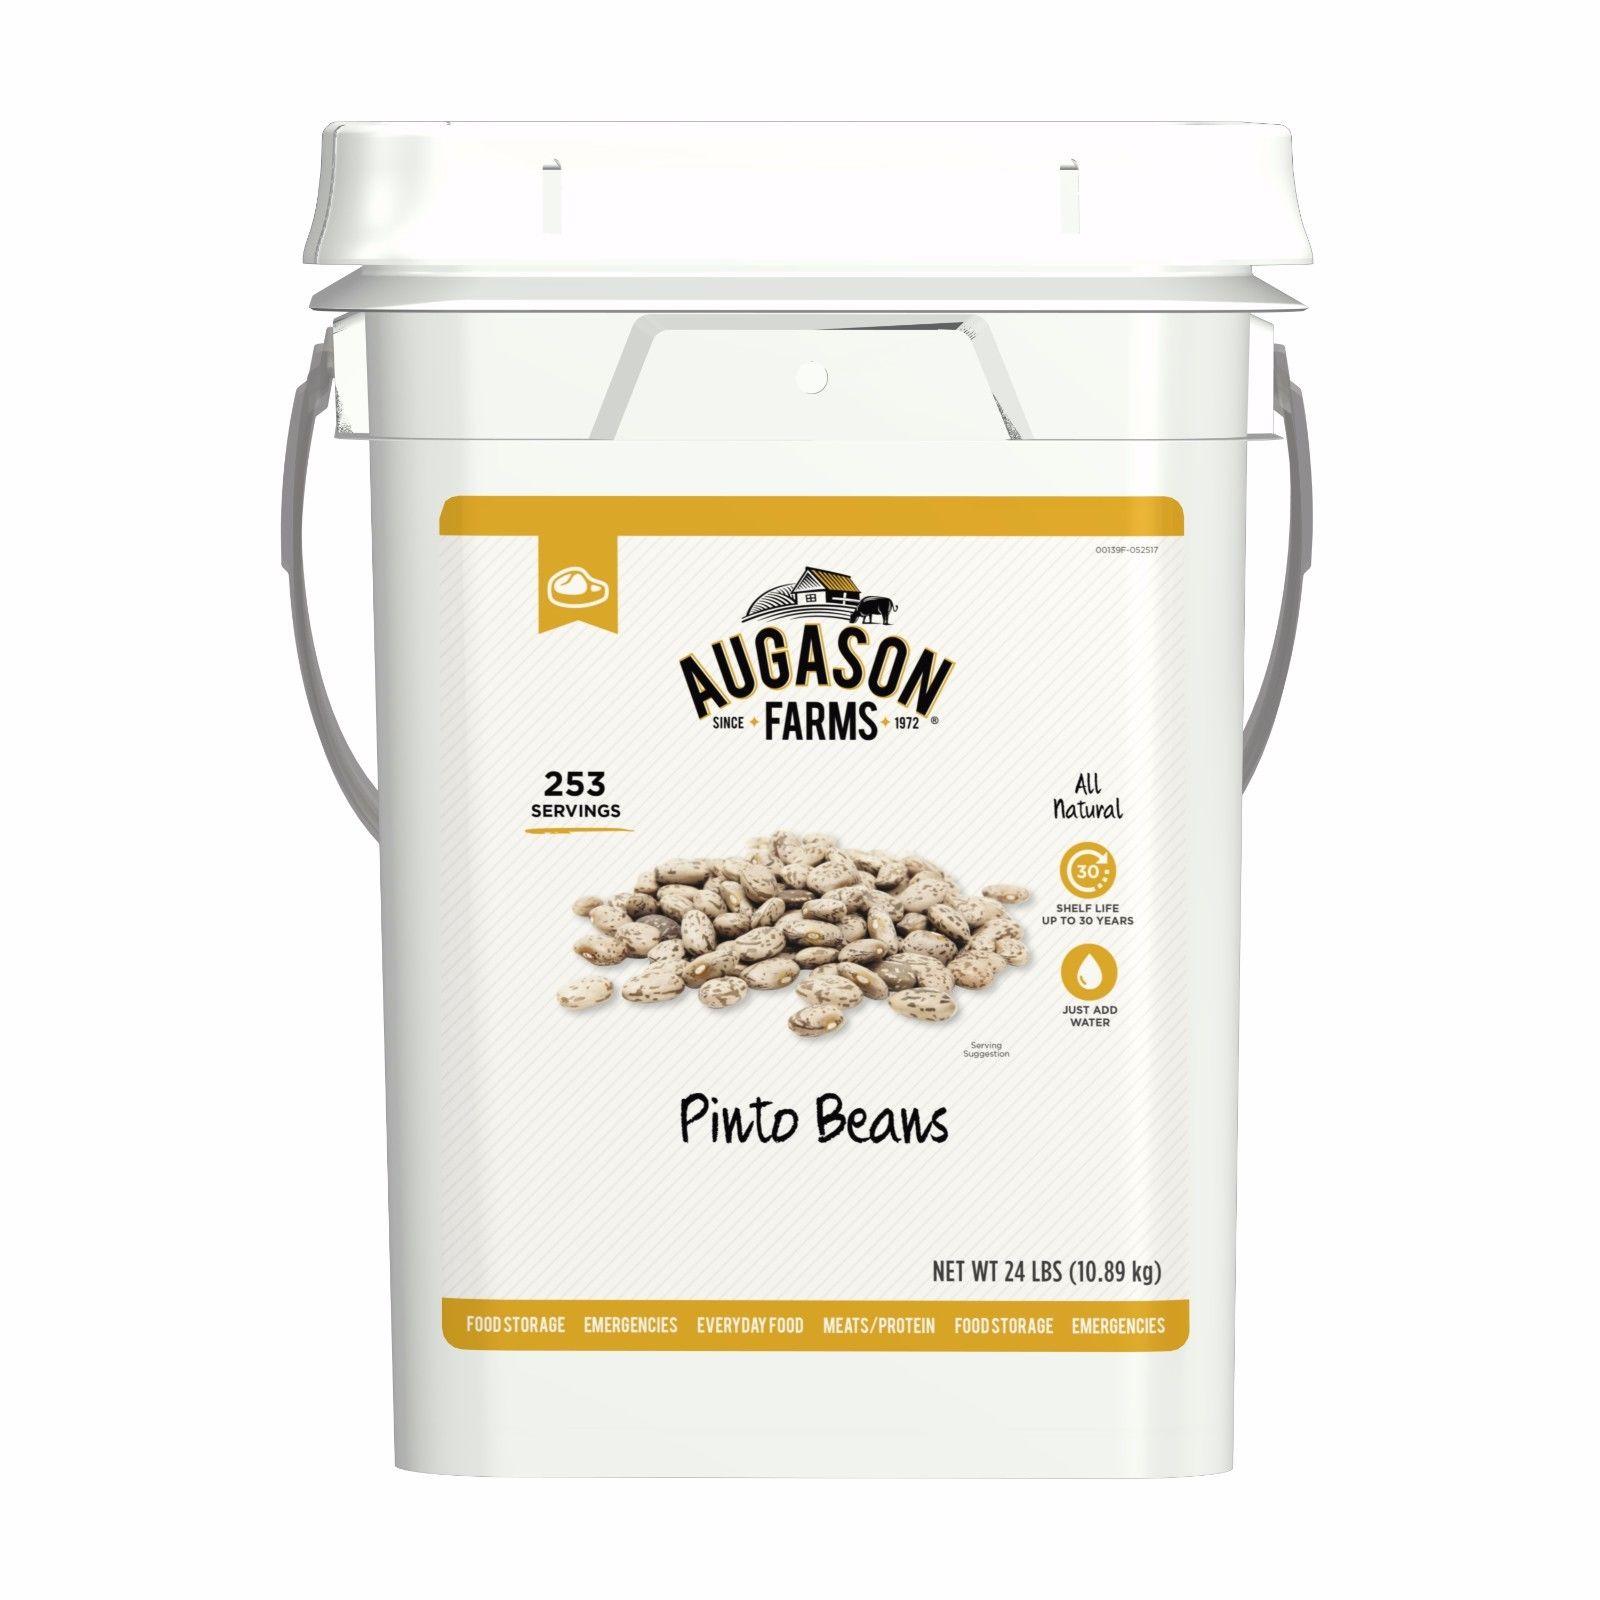 Augason Farms Pinto Beans Emergency Bulk Food Storage 4-Gallon Pail 1